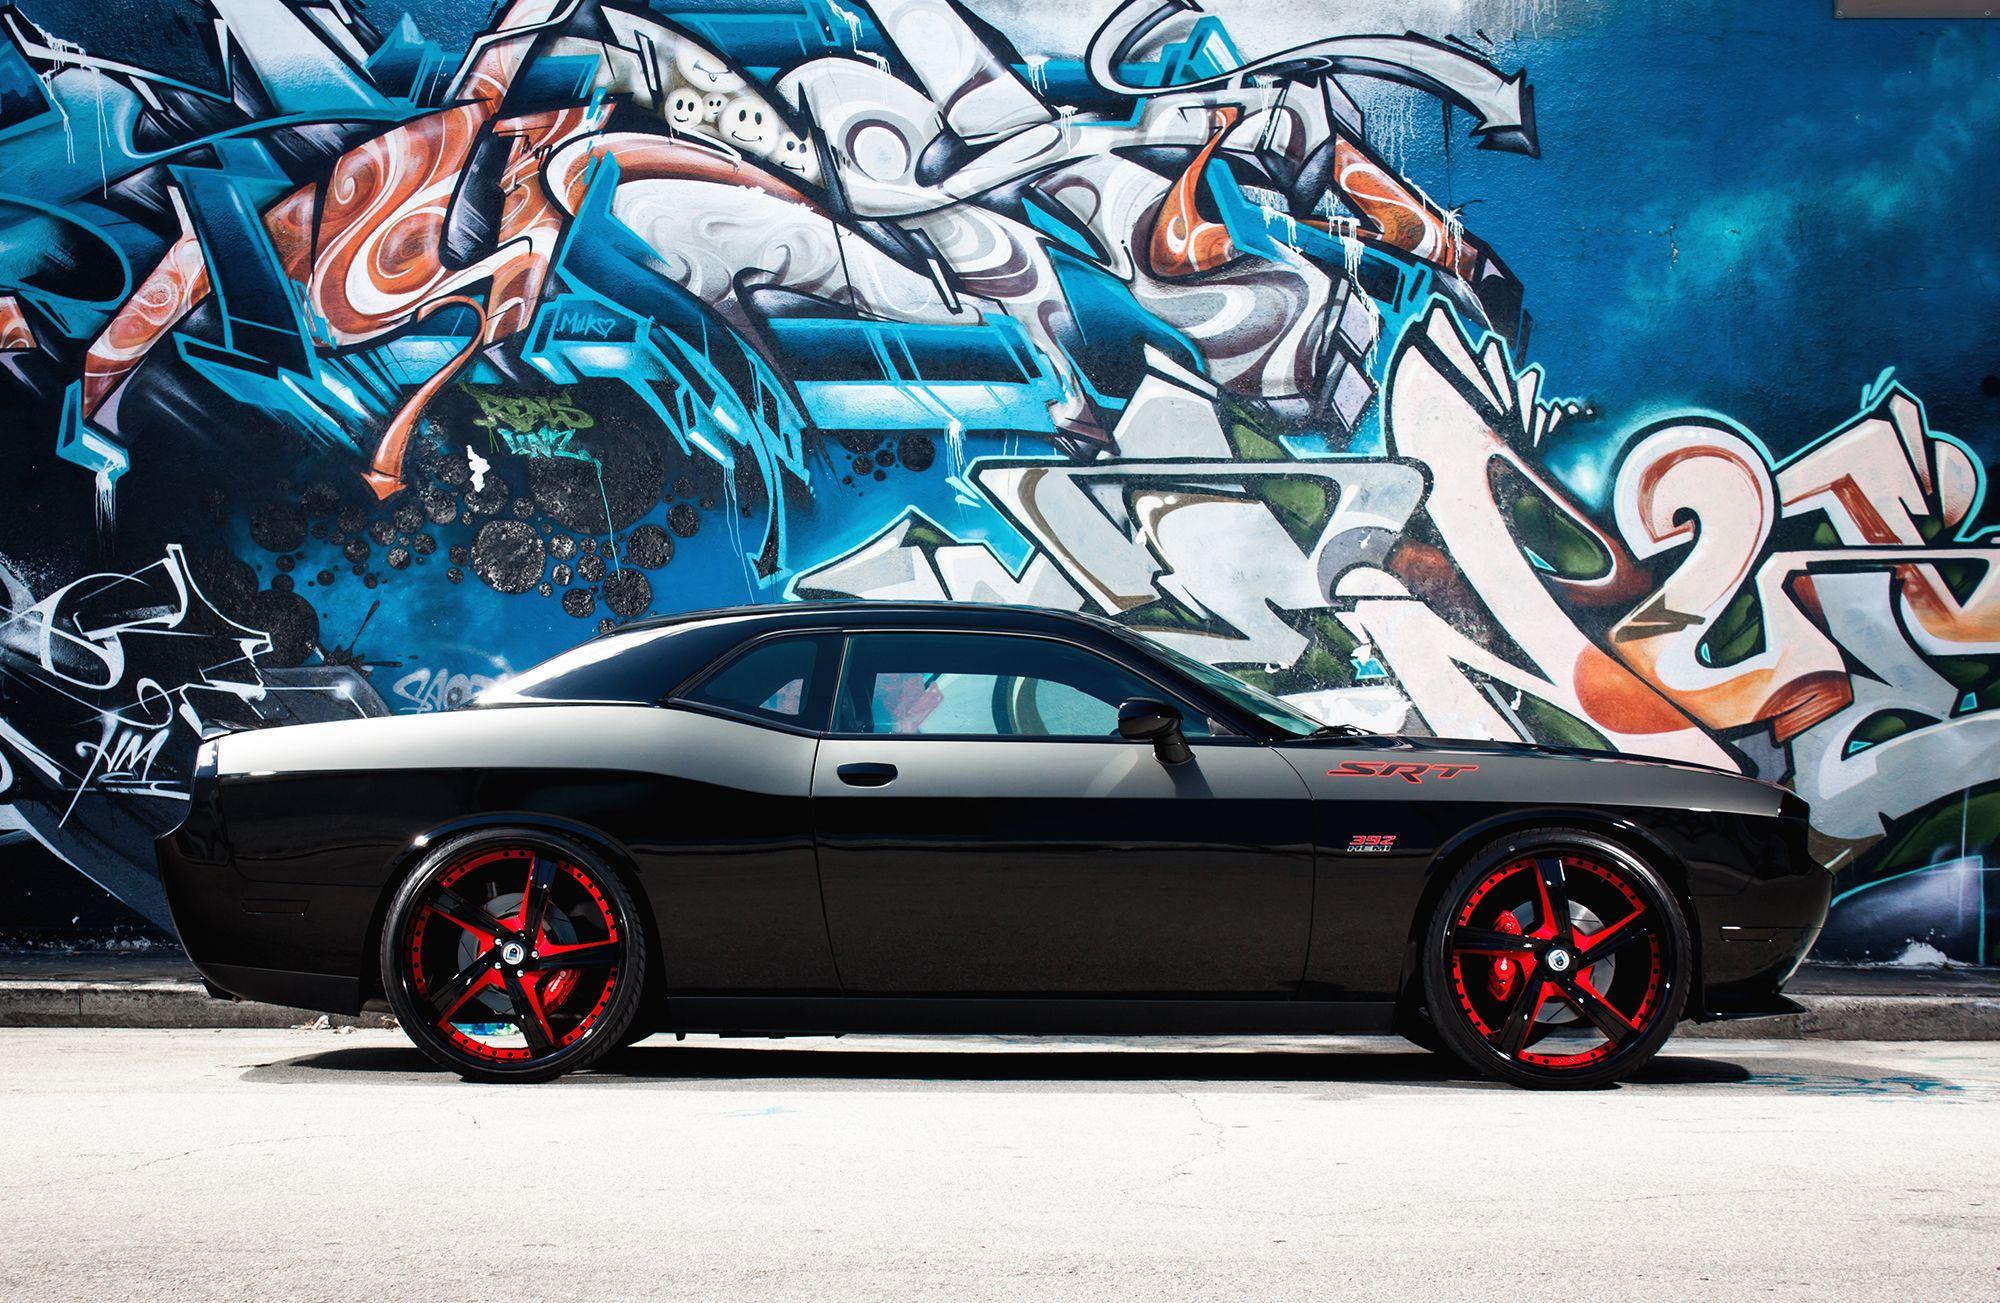 Customized Dodge Challenger SRT8 - Exclusive Motoring - Miami, FL ...